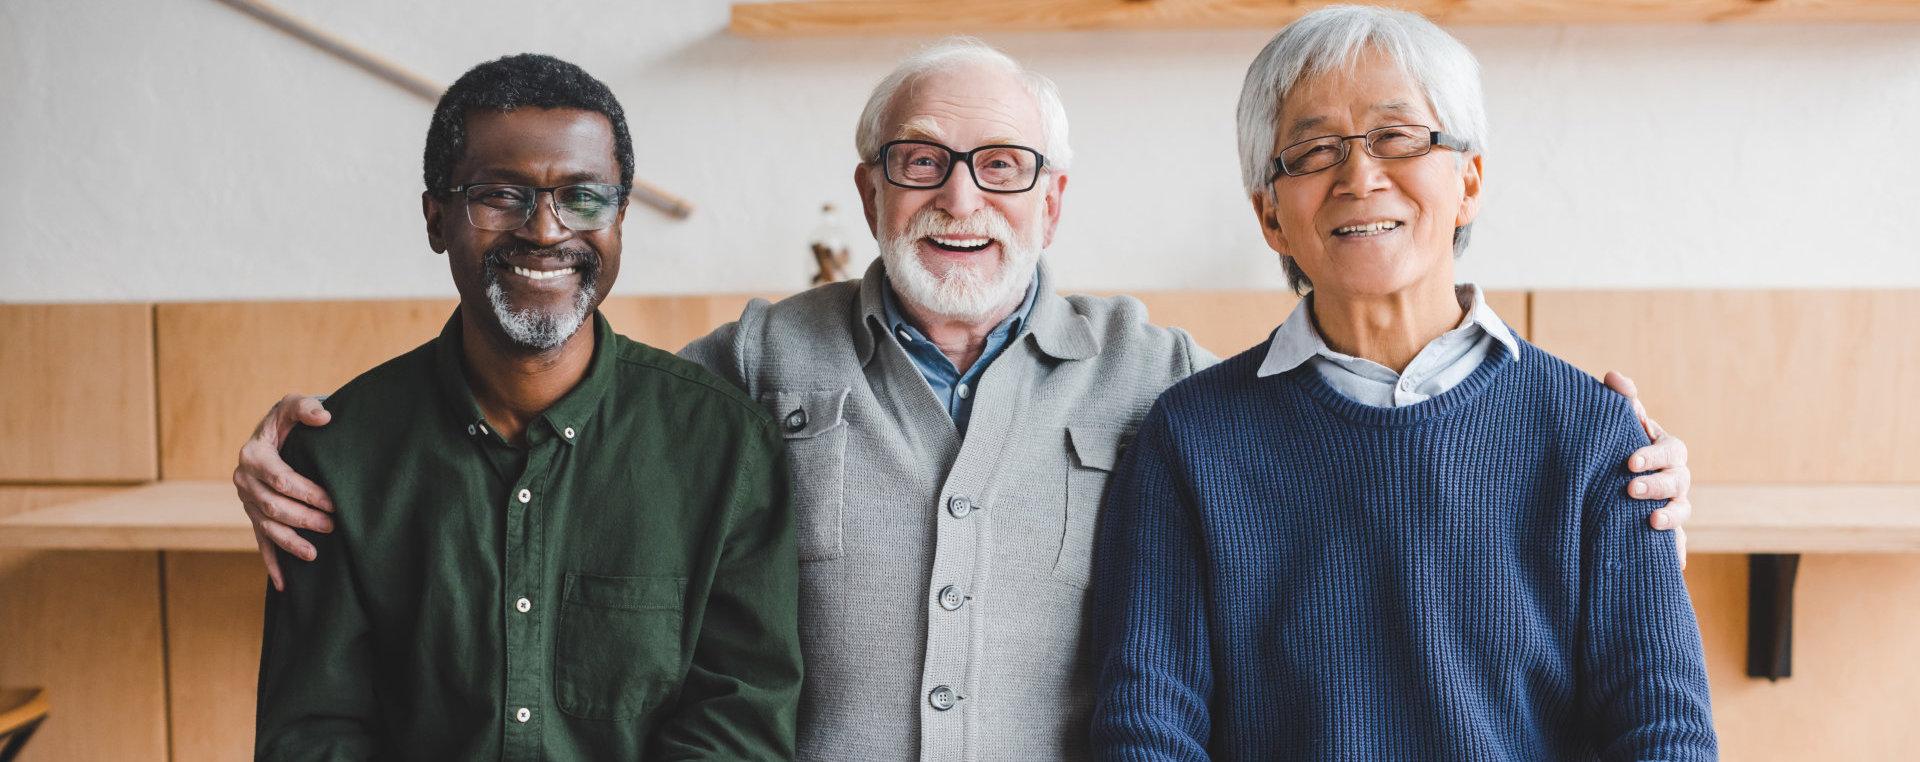 senior men smiling